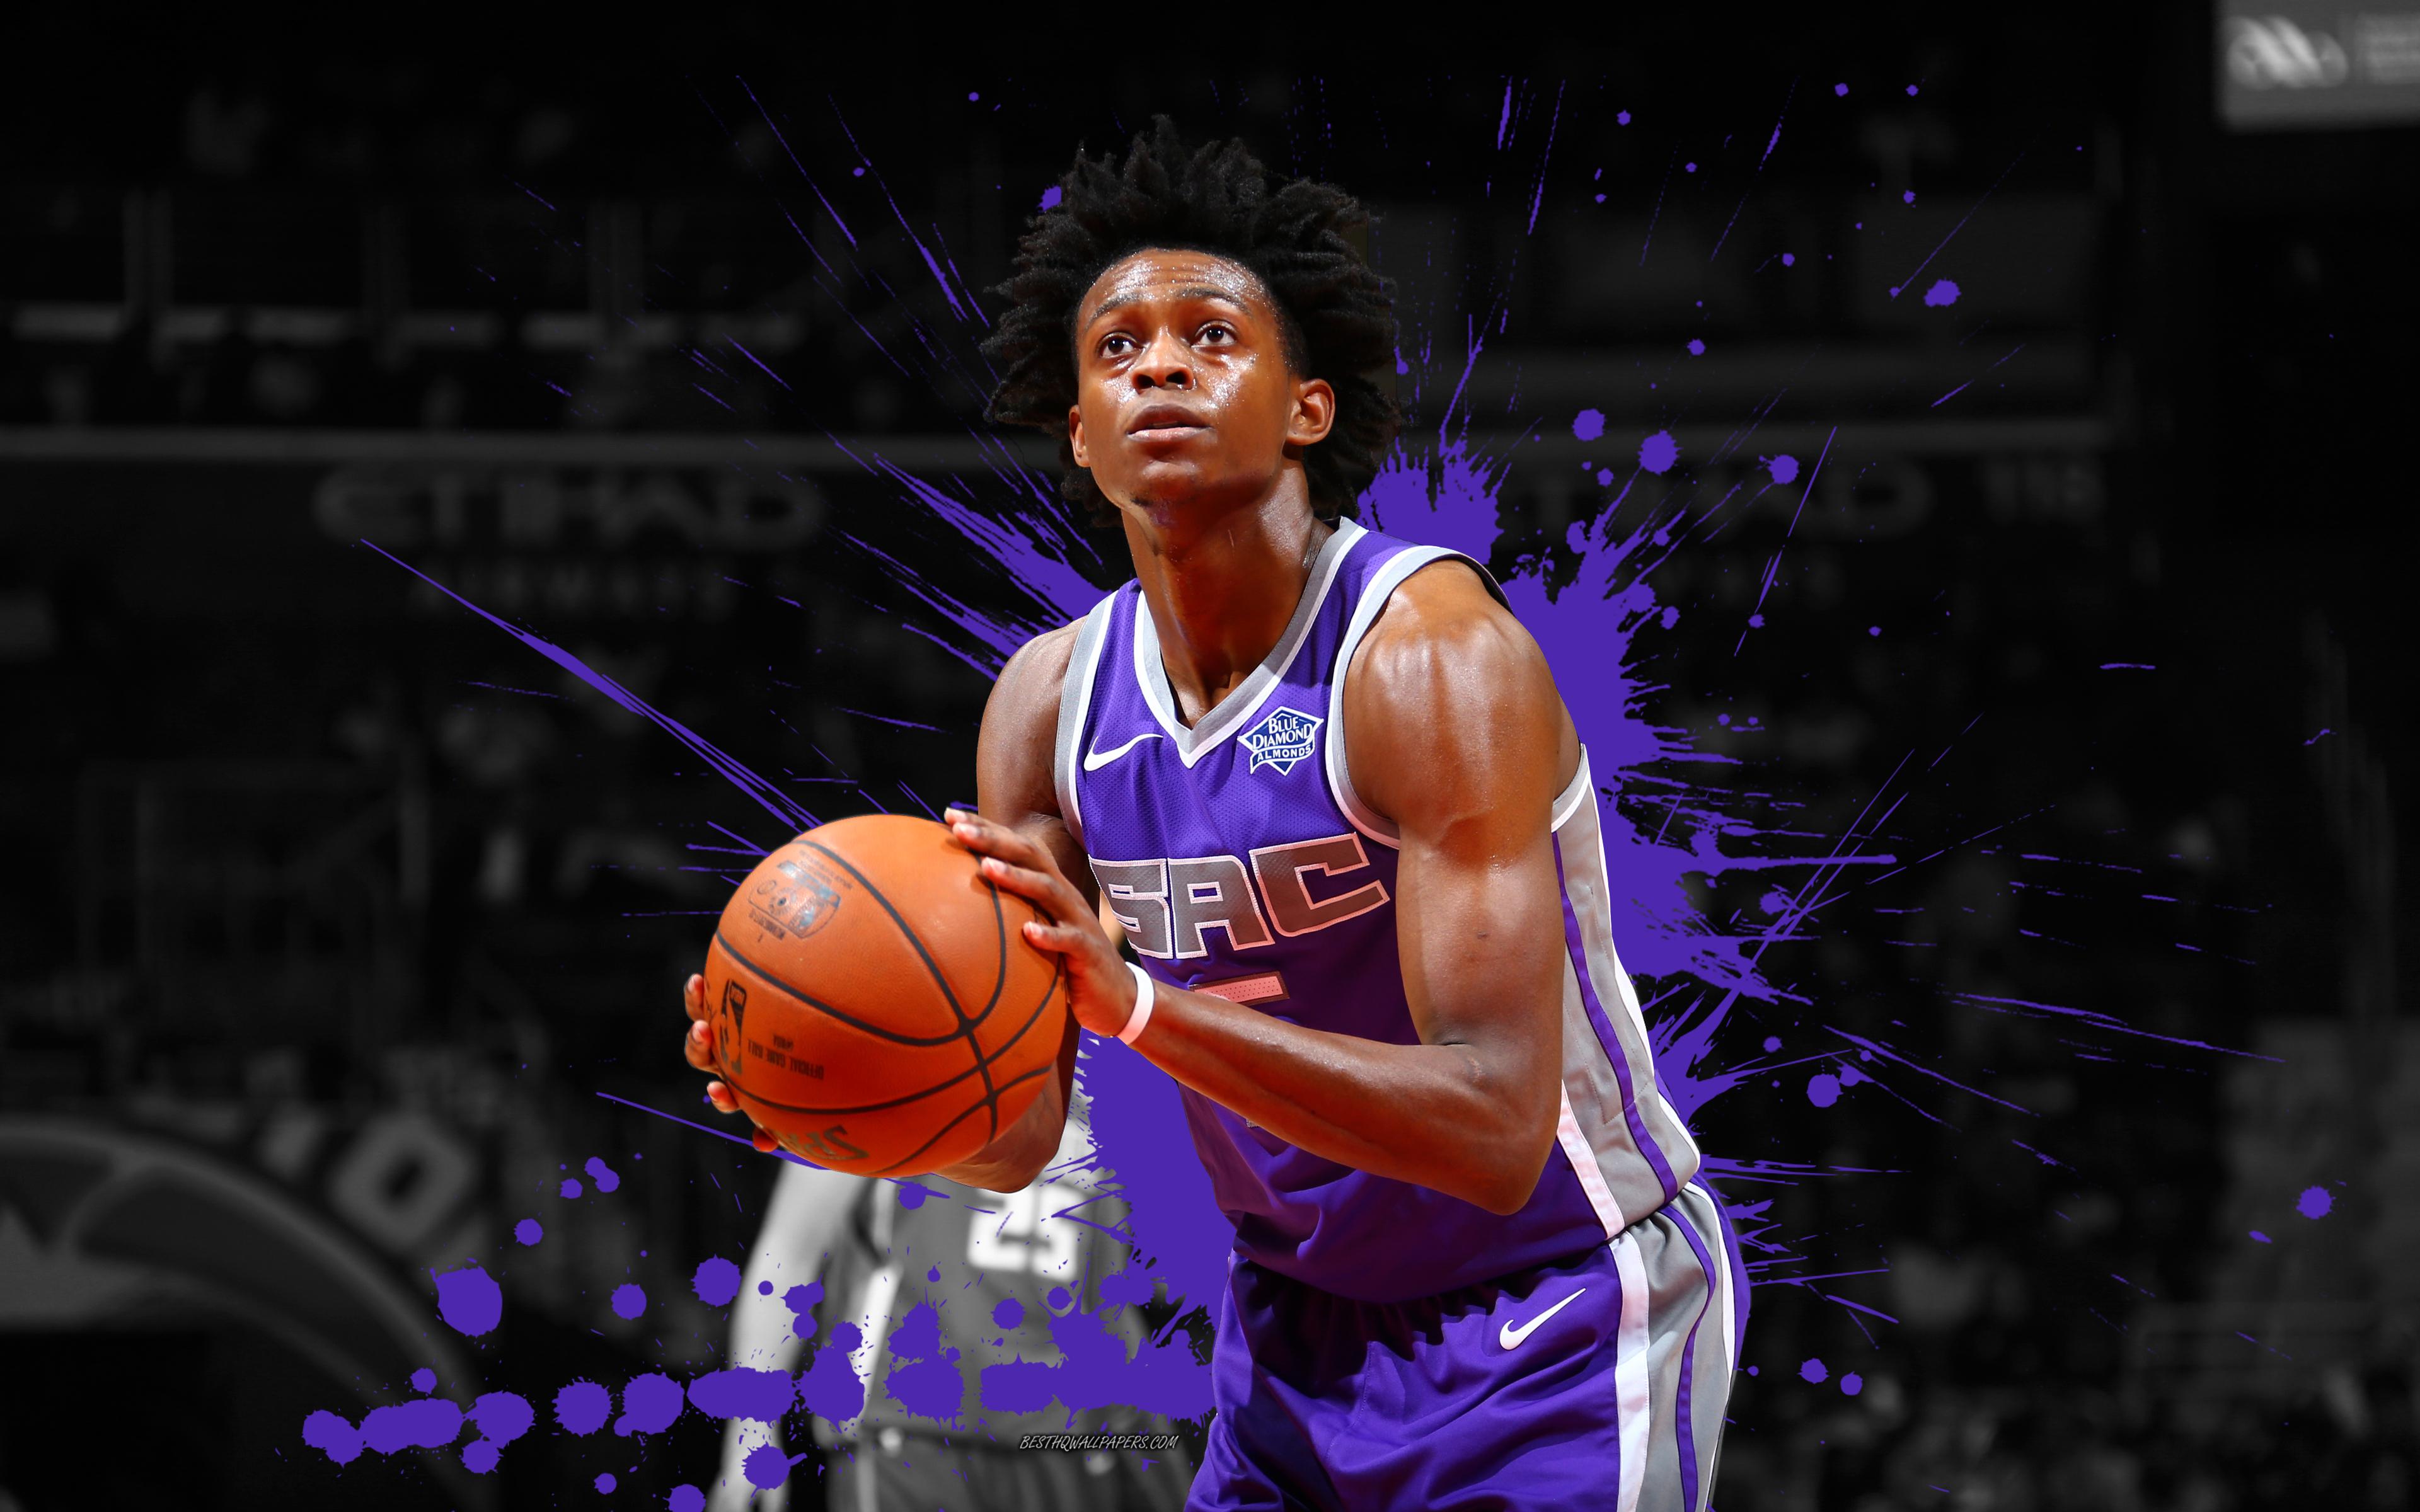 Download wallpapers DeAaron Fox 4k basketball players NBA 3840x2400